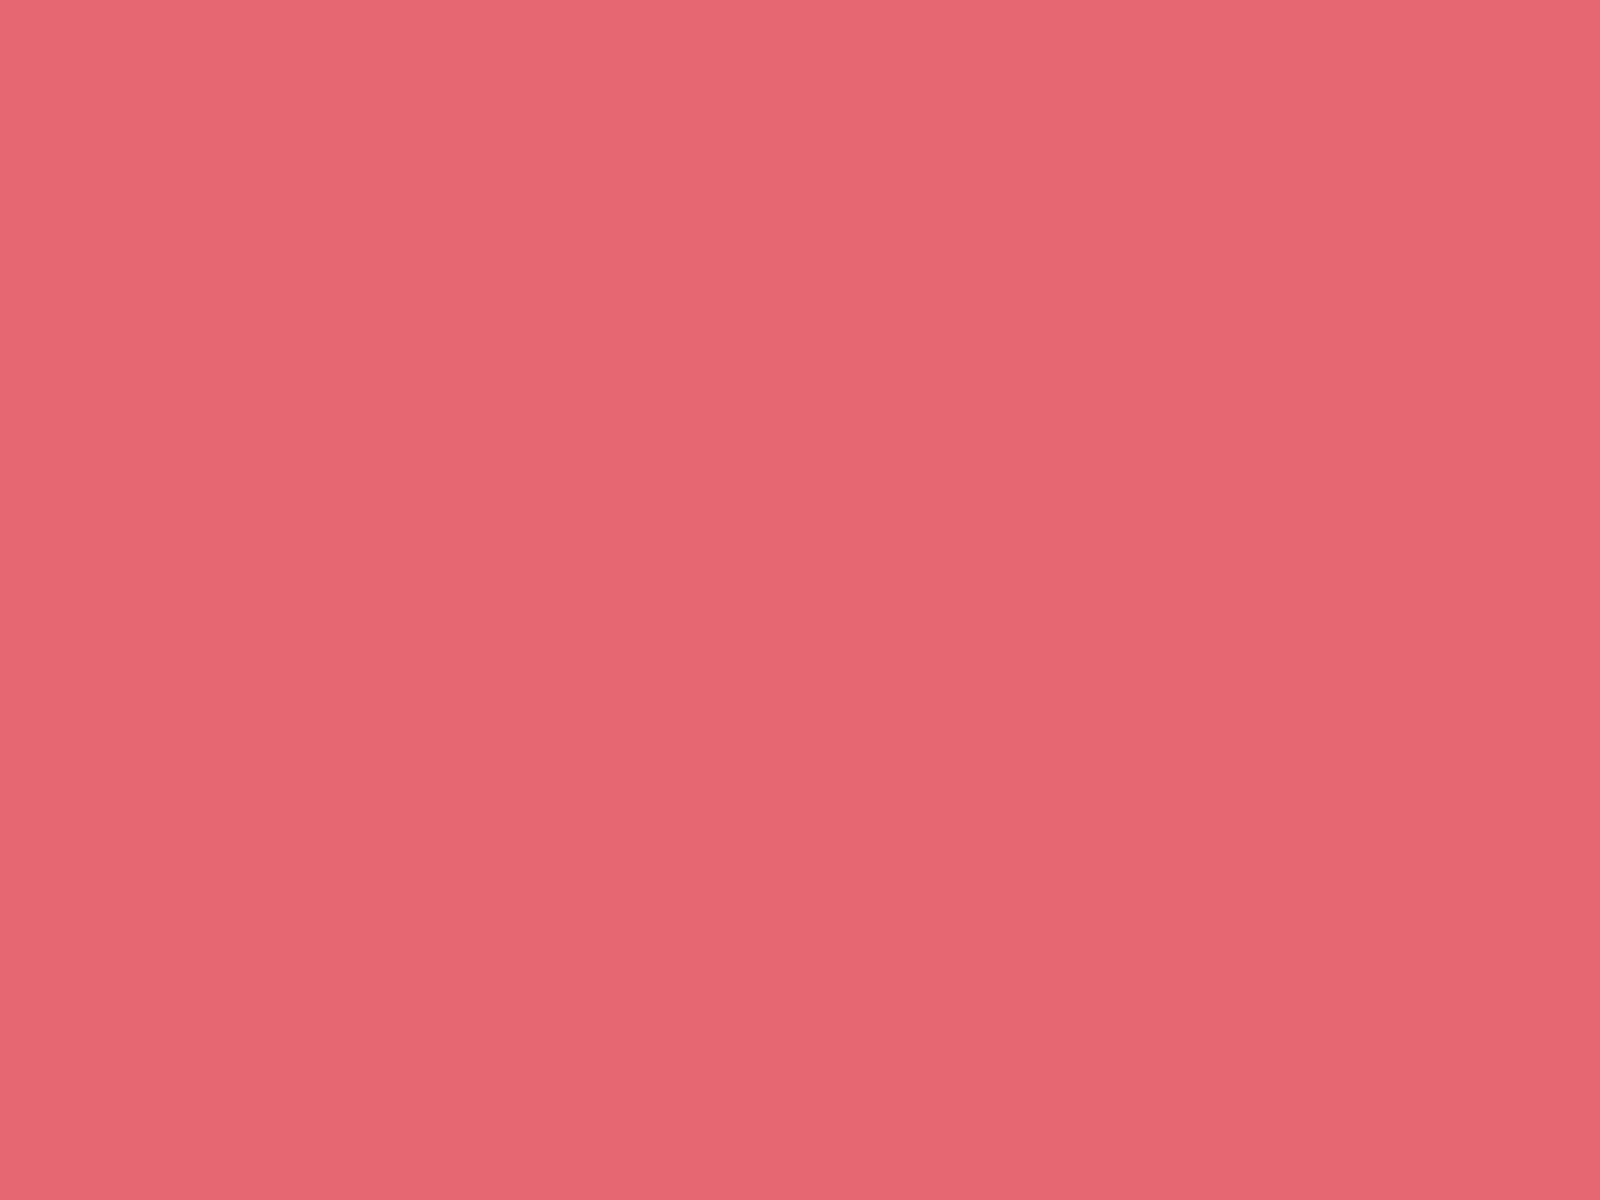 1600x1200 Light Carmine Pink Solid Color Background